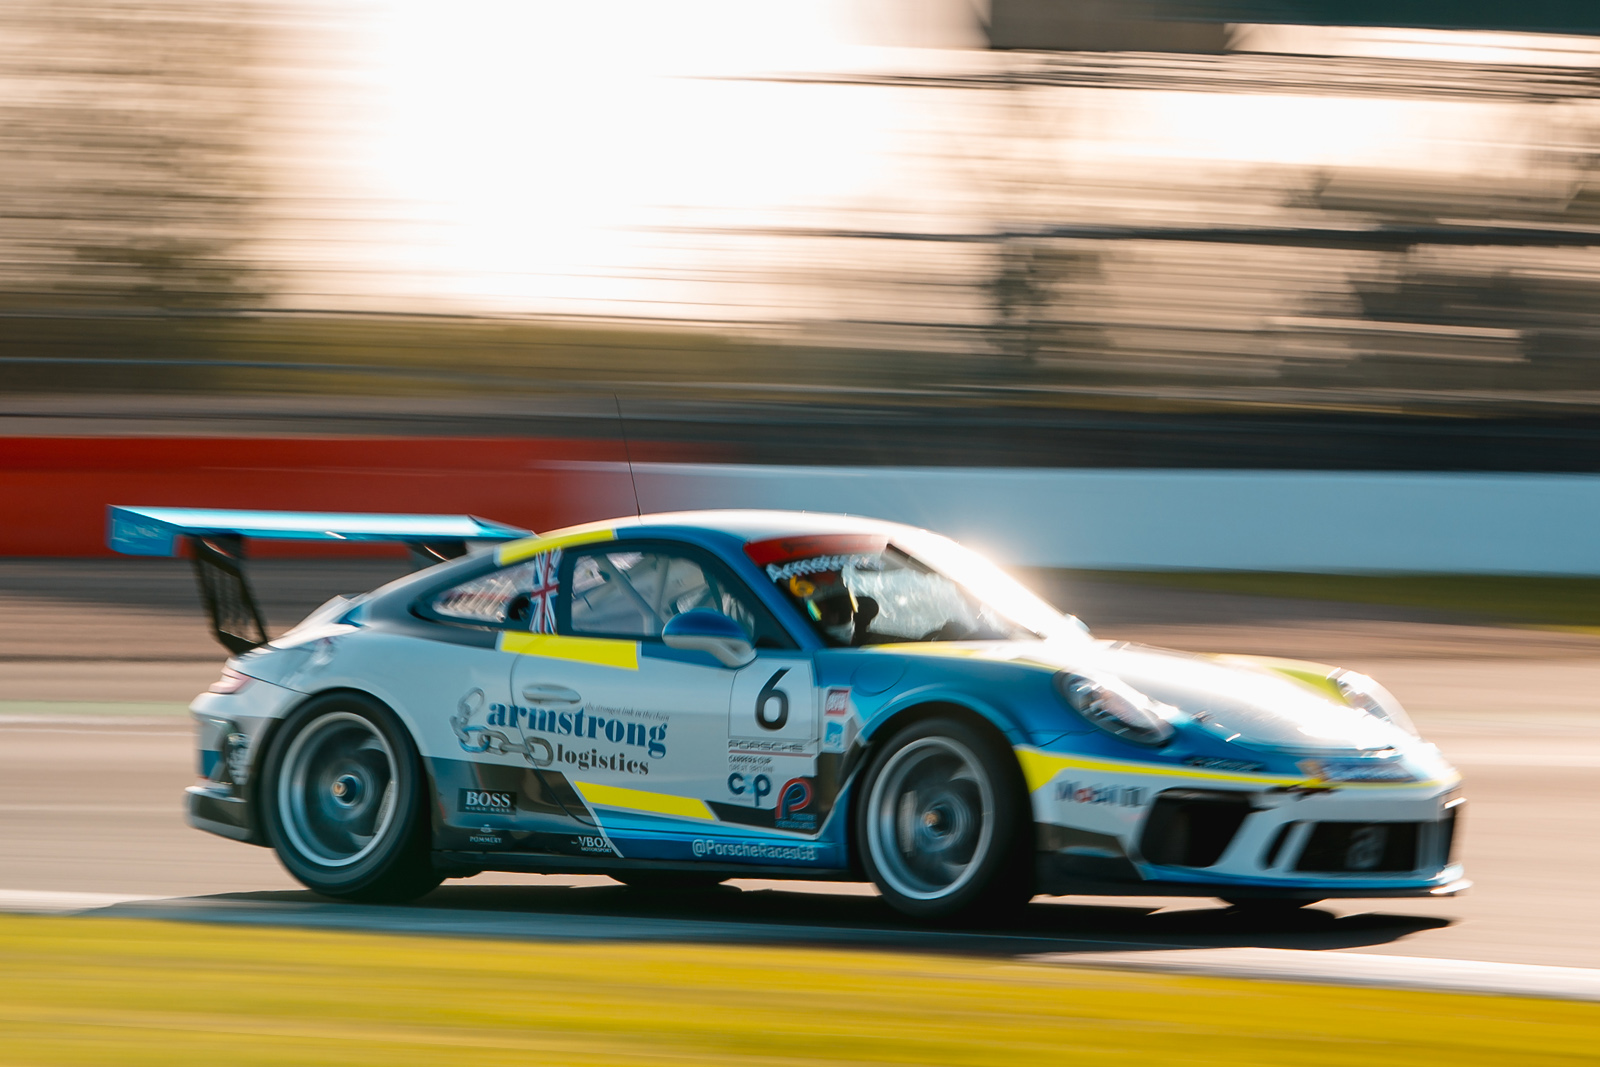 Second GTC Porsche for British GT